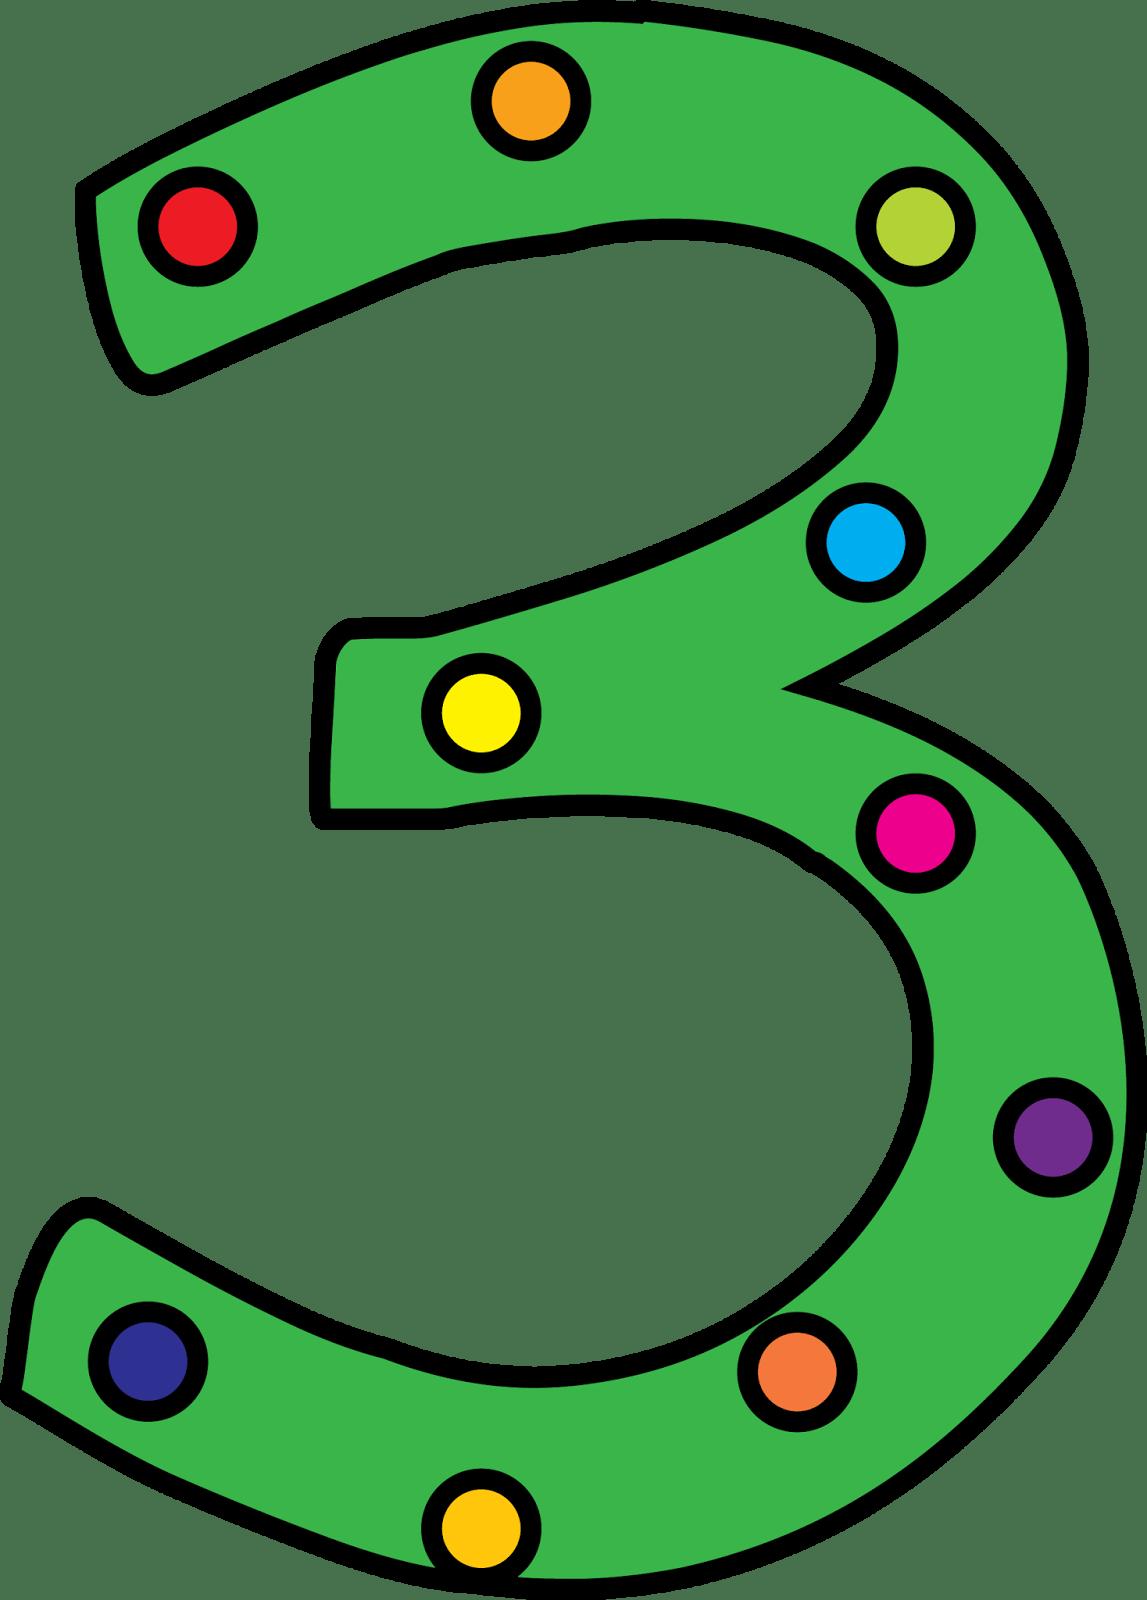 hight resolution of number 3 vector clip art 9e6 number 3 clip art